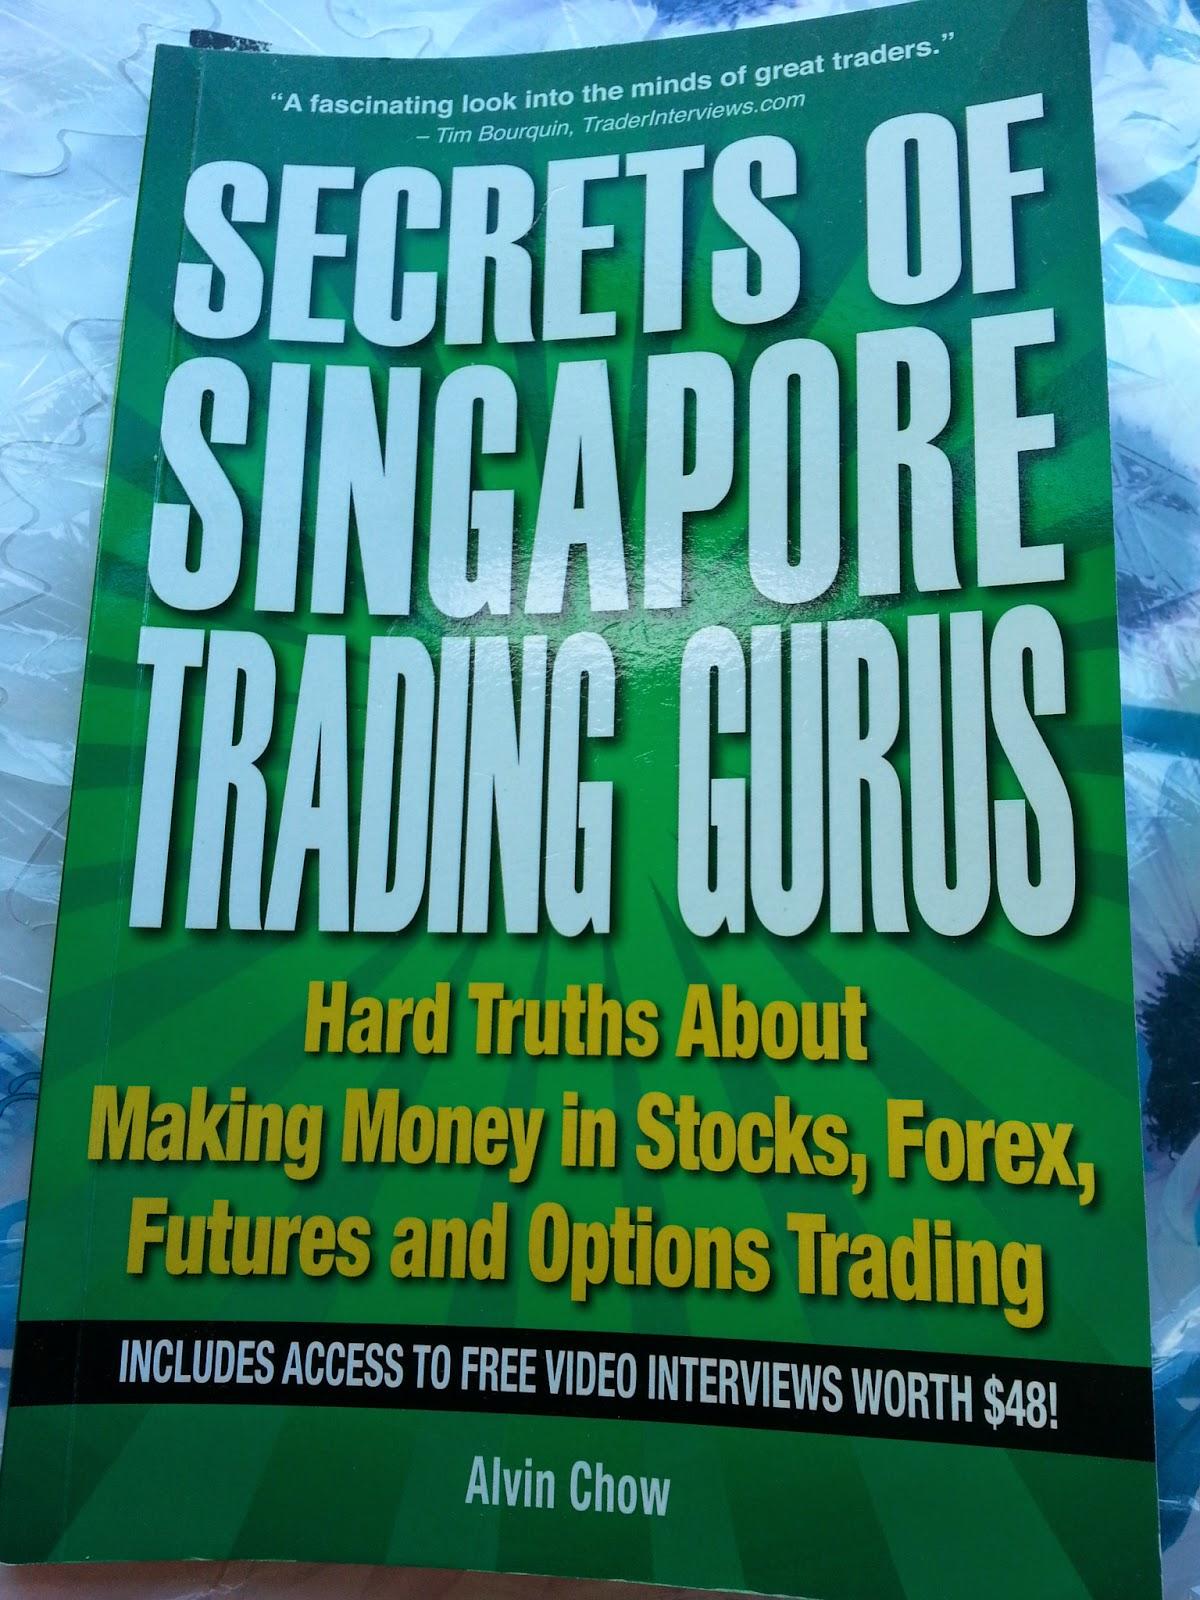 Forex trading gurus